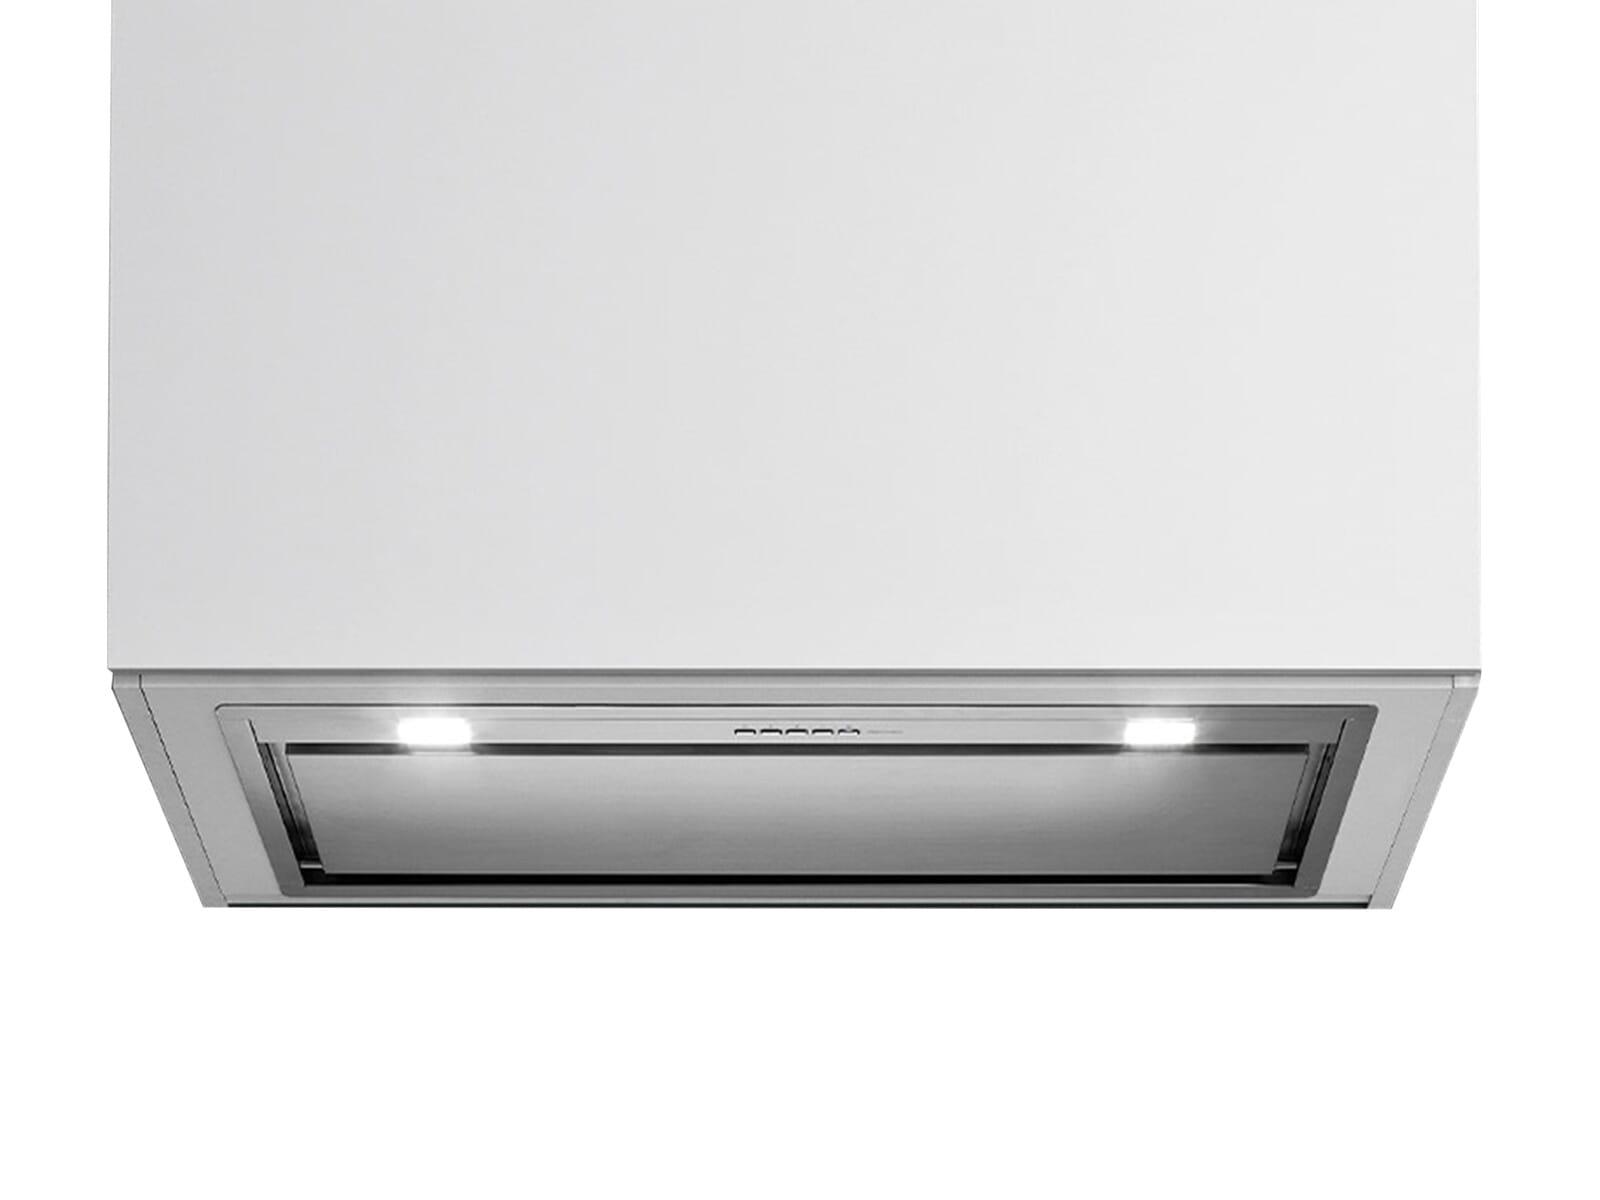 Falmec Lüfterbaustein Dunstabzugshaube Edelstahl 50 cm